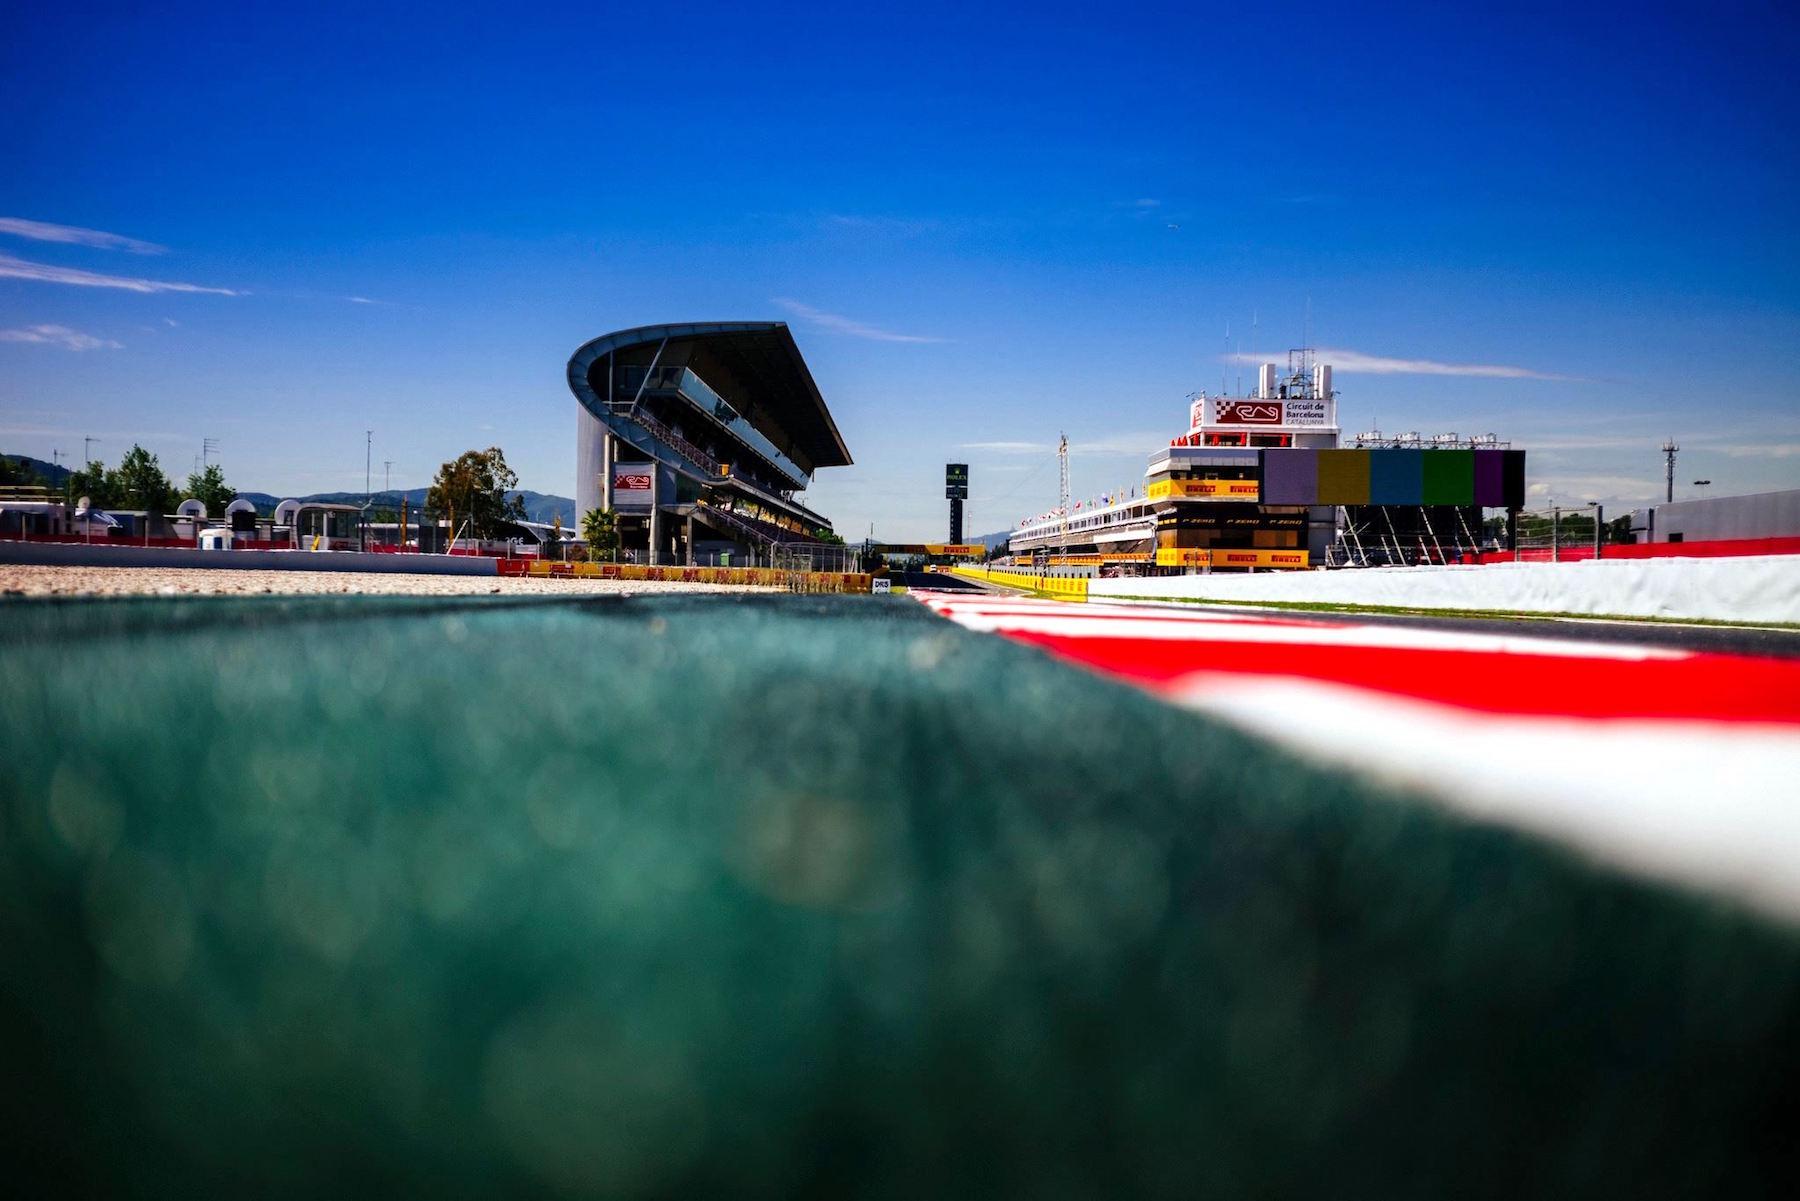 Salracing   Circuit de Barcelona-Catalunya